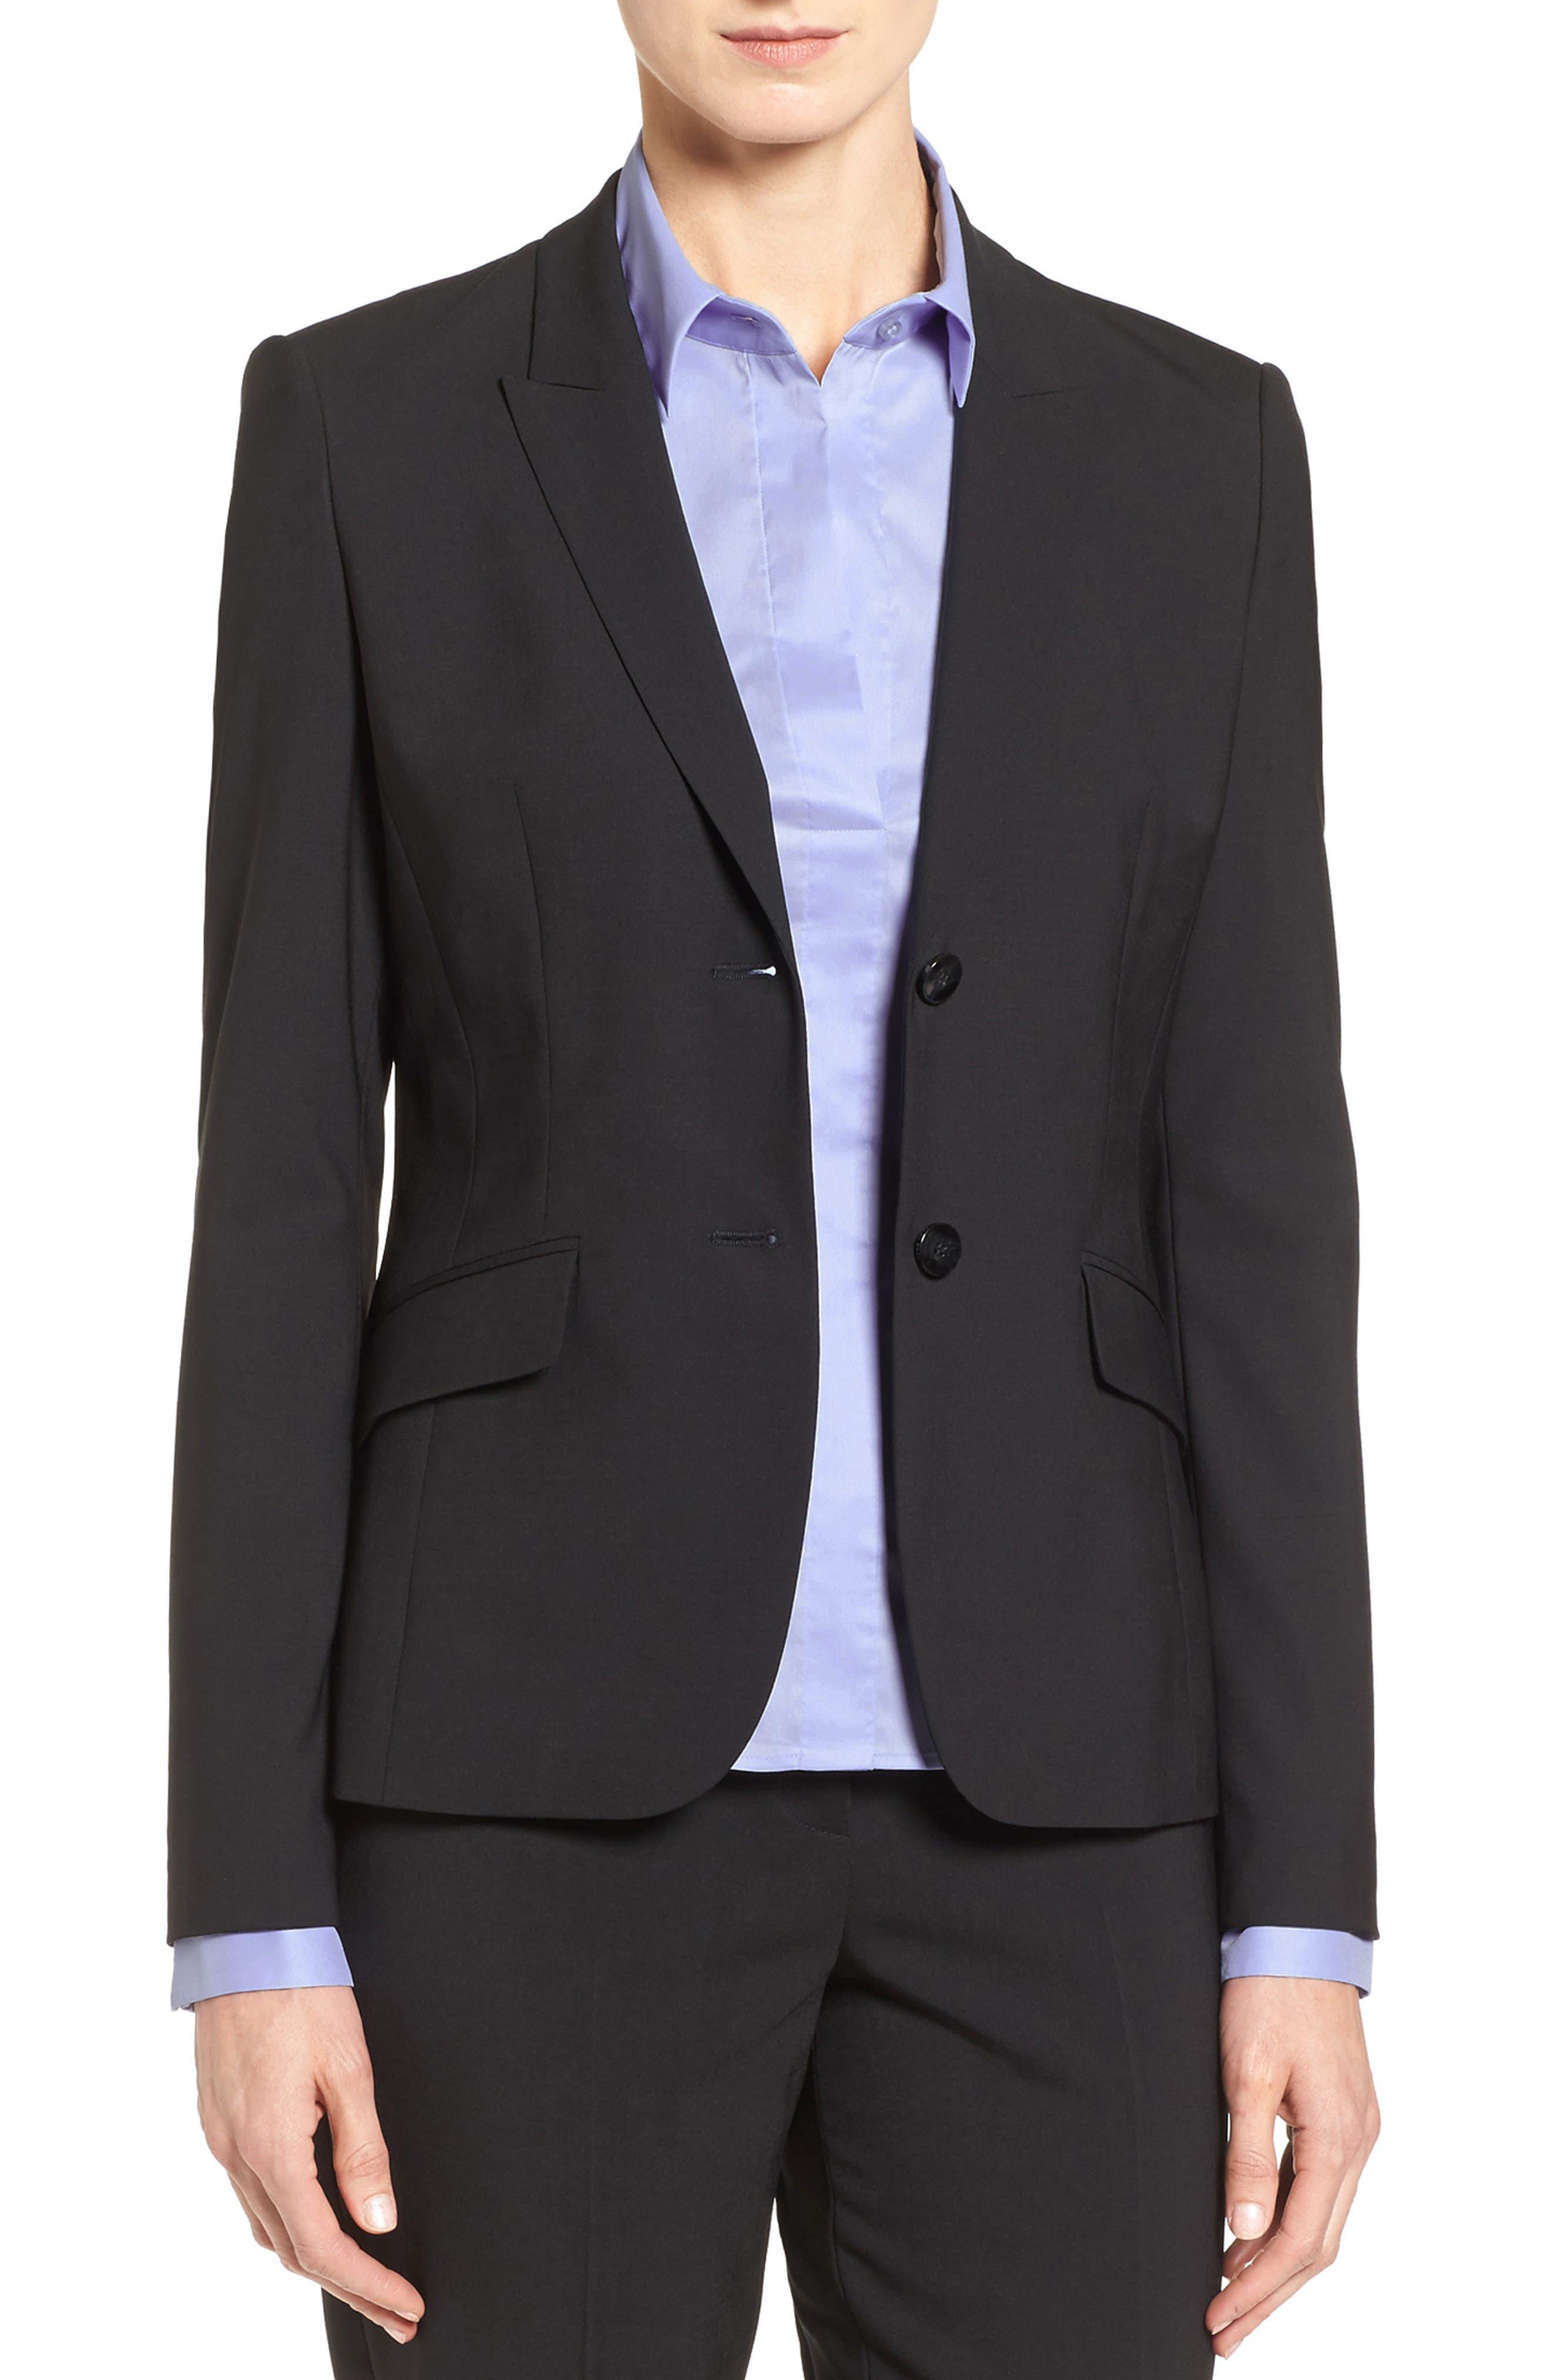 Julea Tropical Stretch Wool Jacket,                             Alternate thumbnail 6, color,                             BLACK